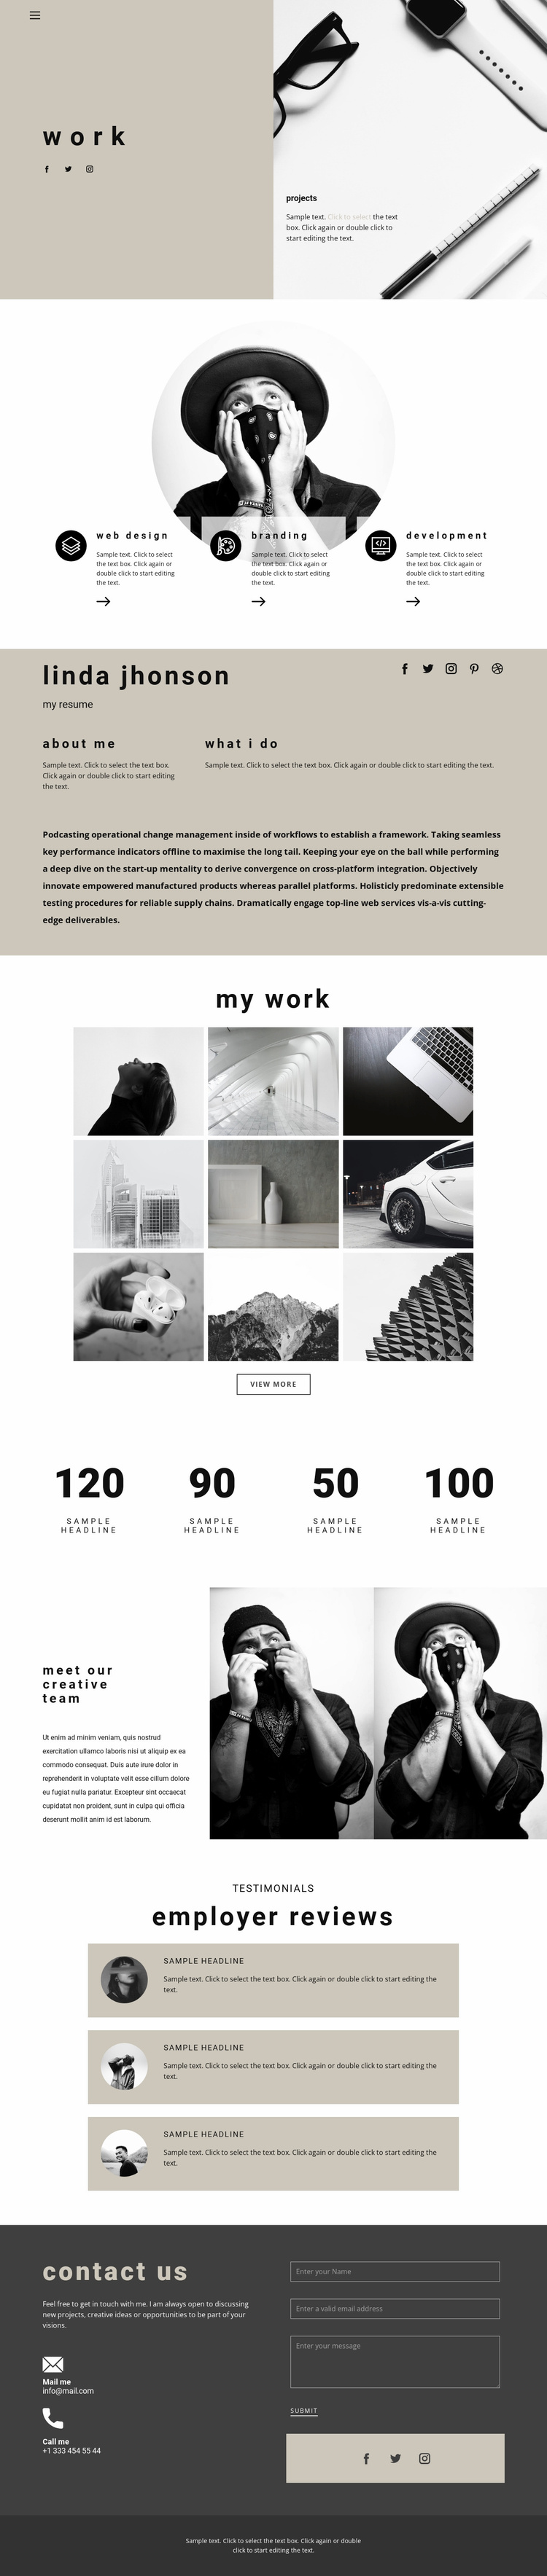 Art space resume Website Template